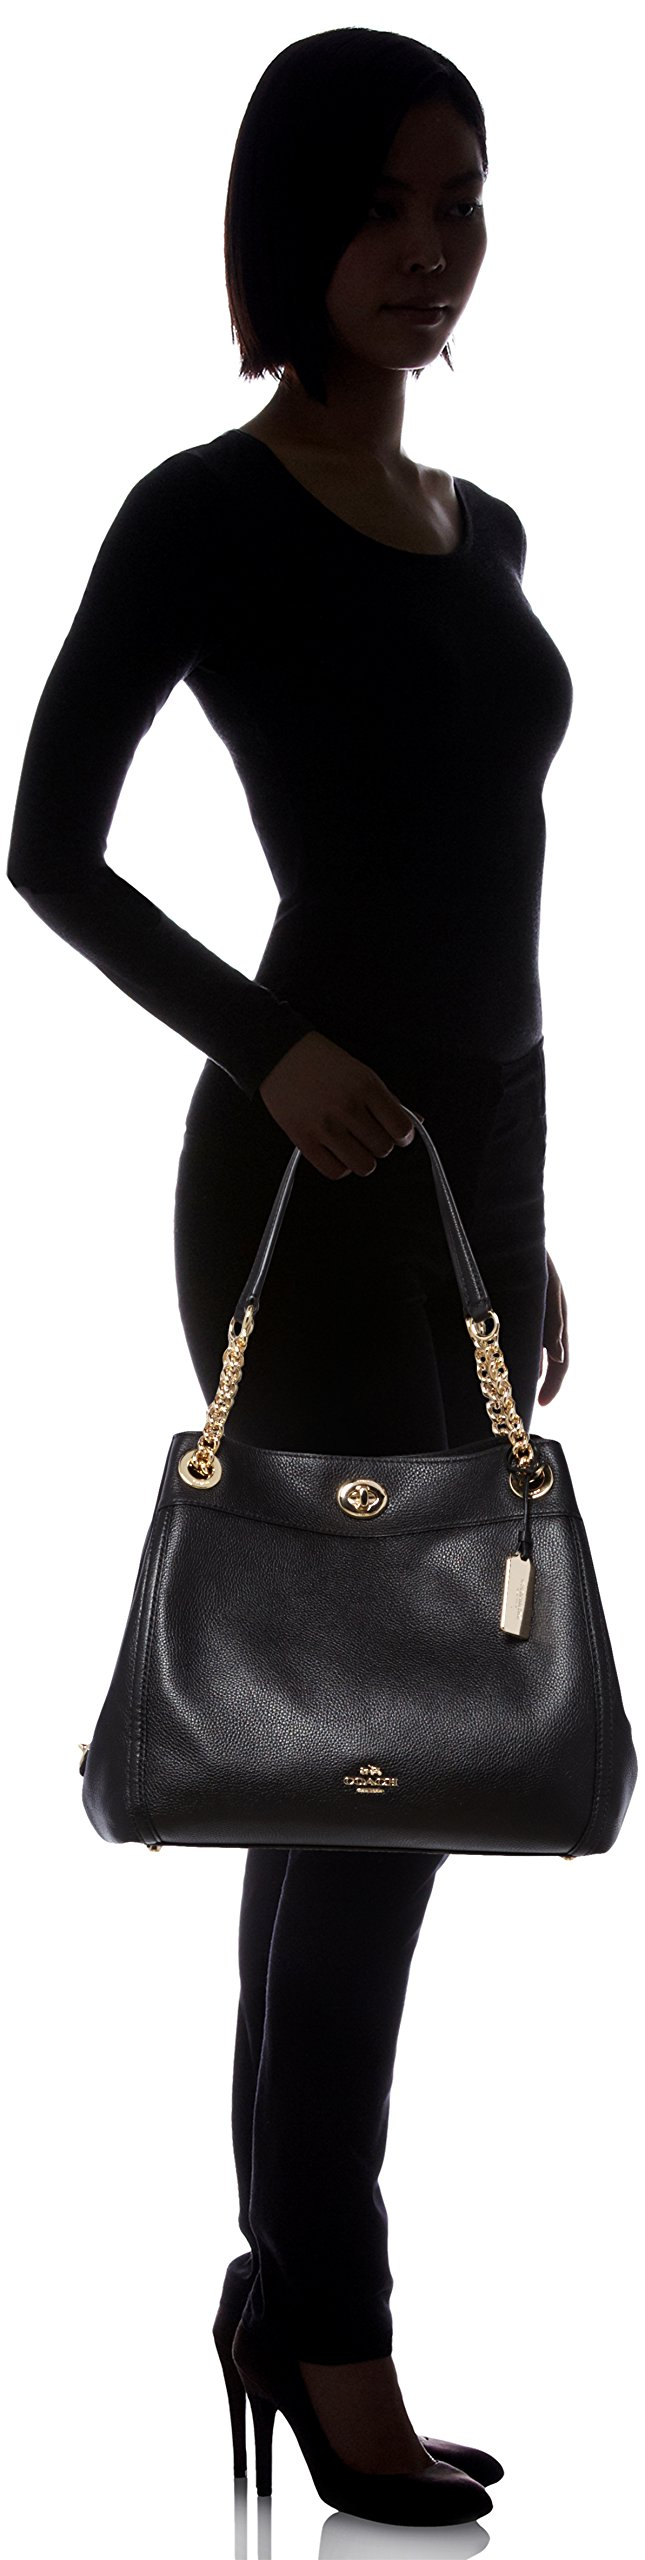 COACH Women's Turnlock Edie LI/Black Shoulder Bag by Coach (Image #6)